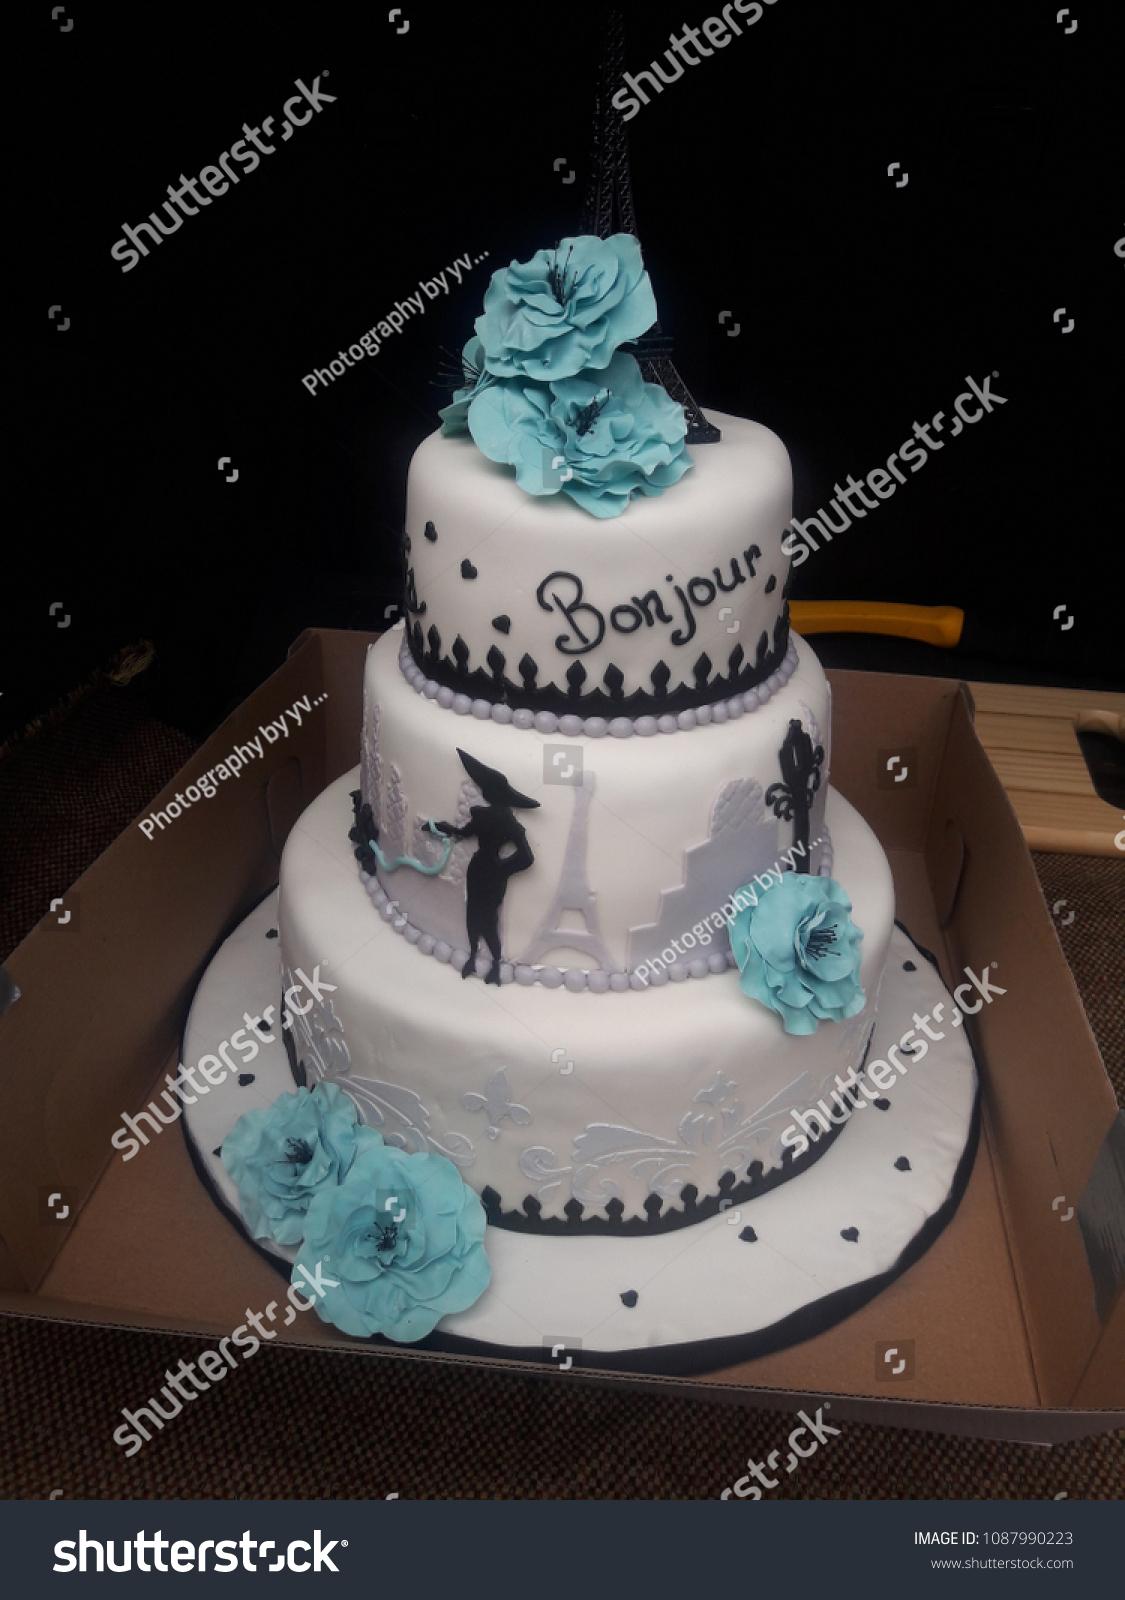 Groovy Paris Birthday Cake Stock Photo Edit Now 1087990223 Funny Birthday Cards Online Alyptdamsfinfo